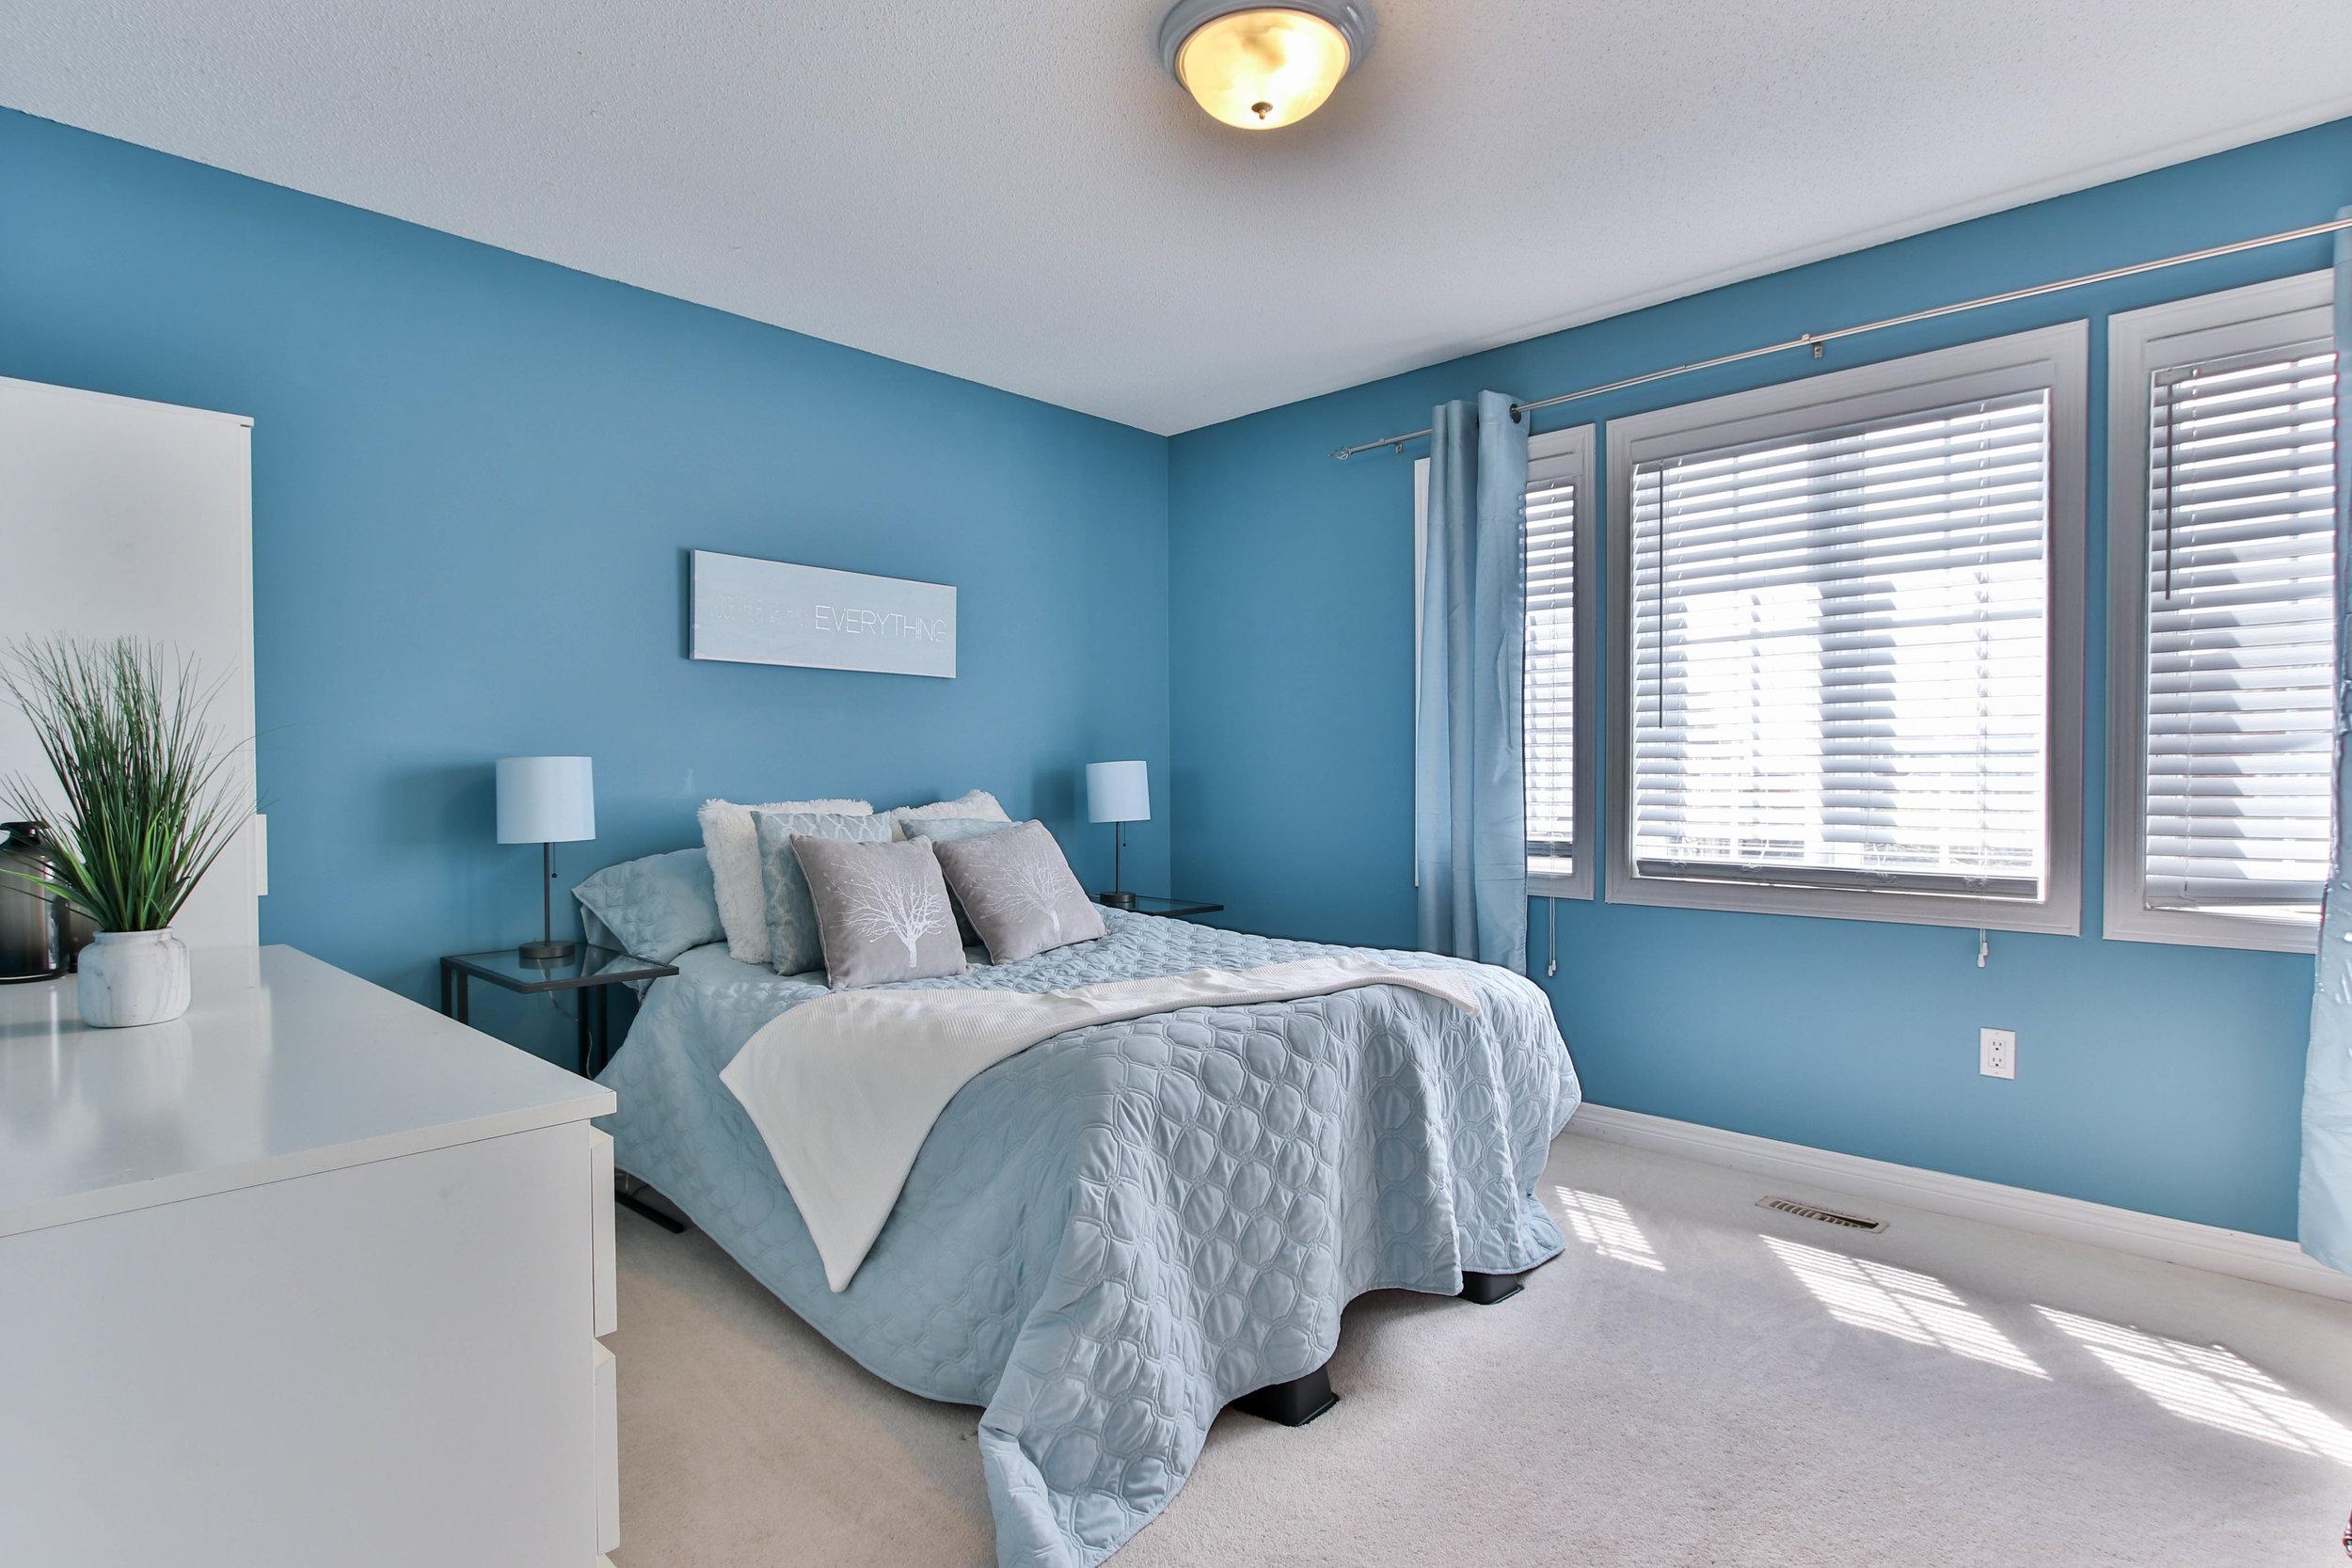 31_Bedroom (1 of 1).jpg